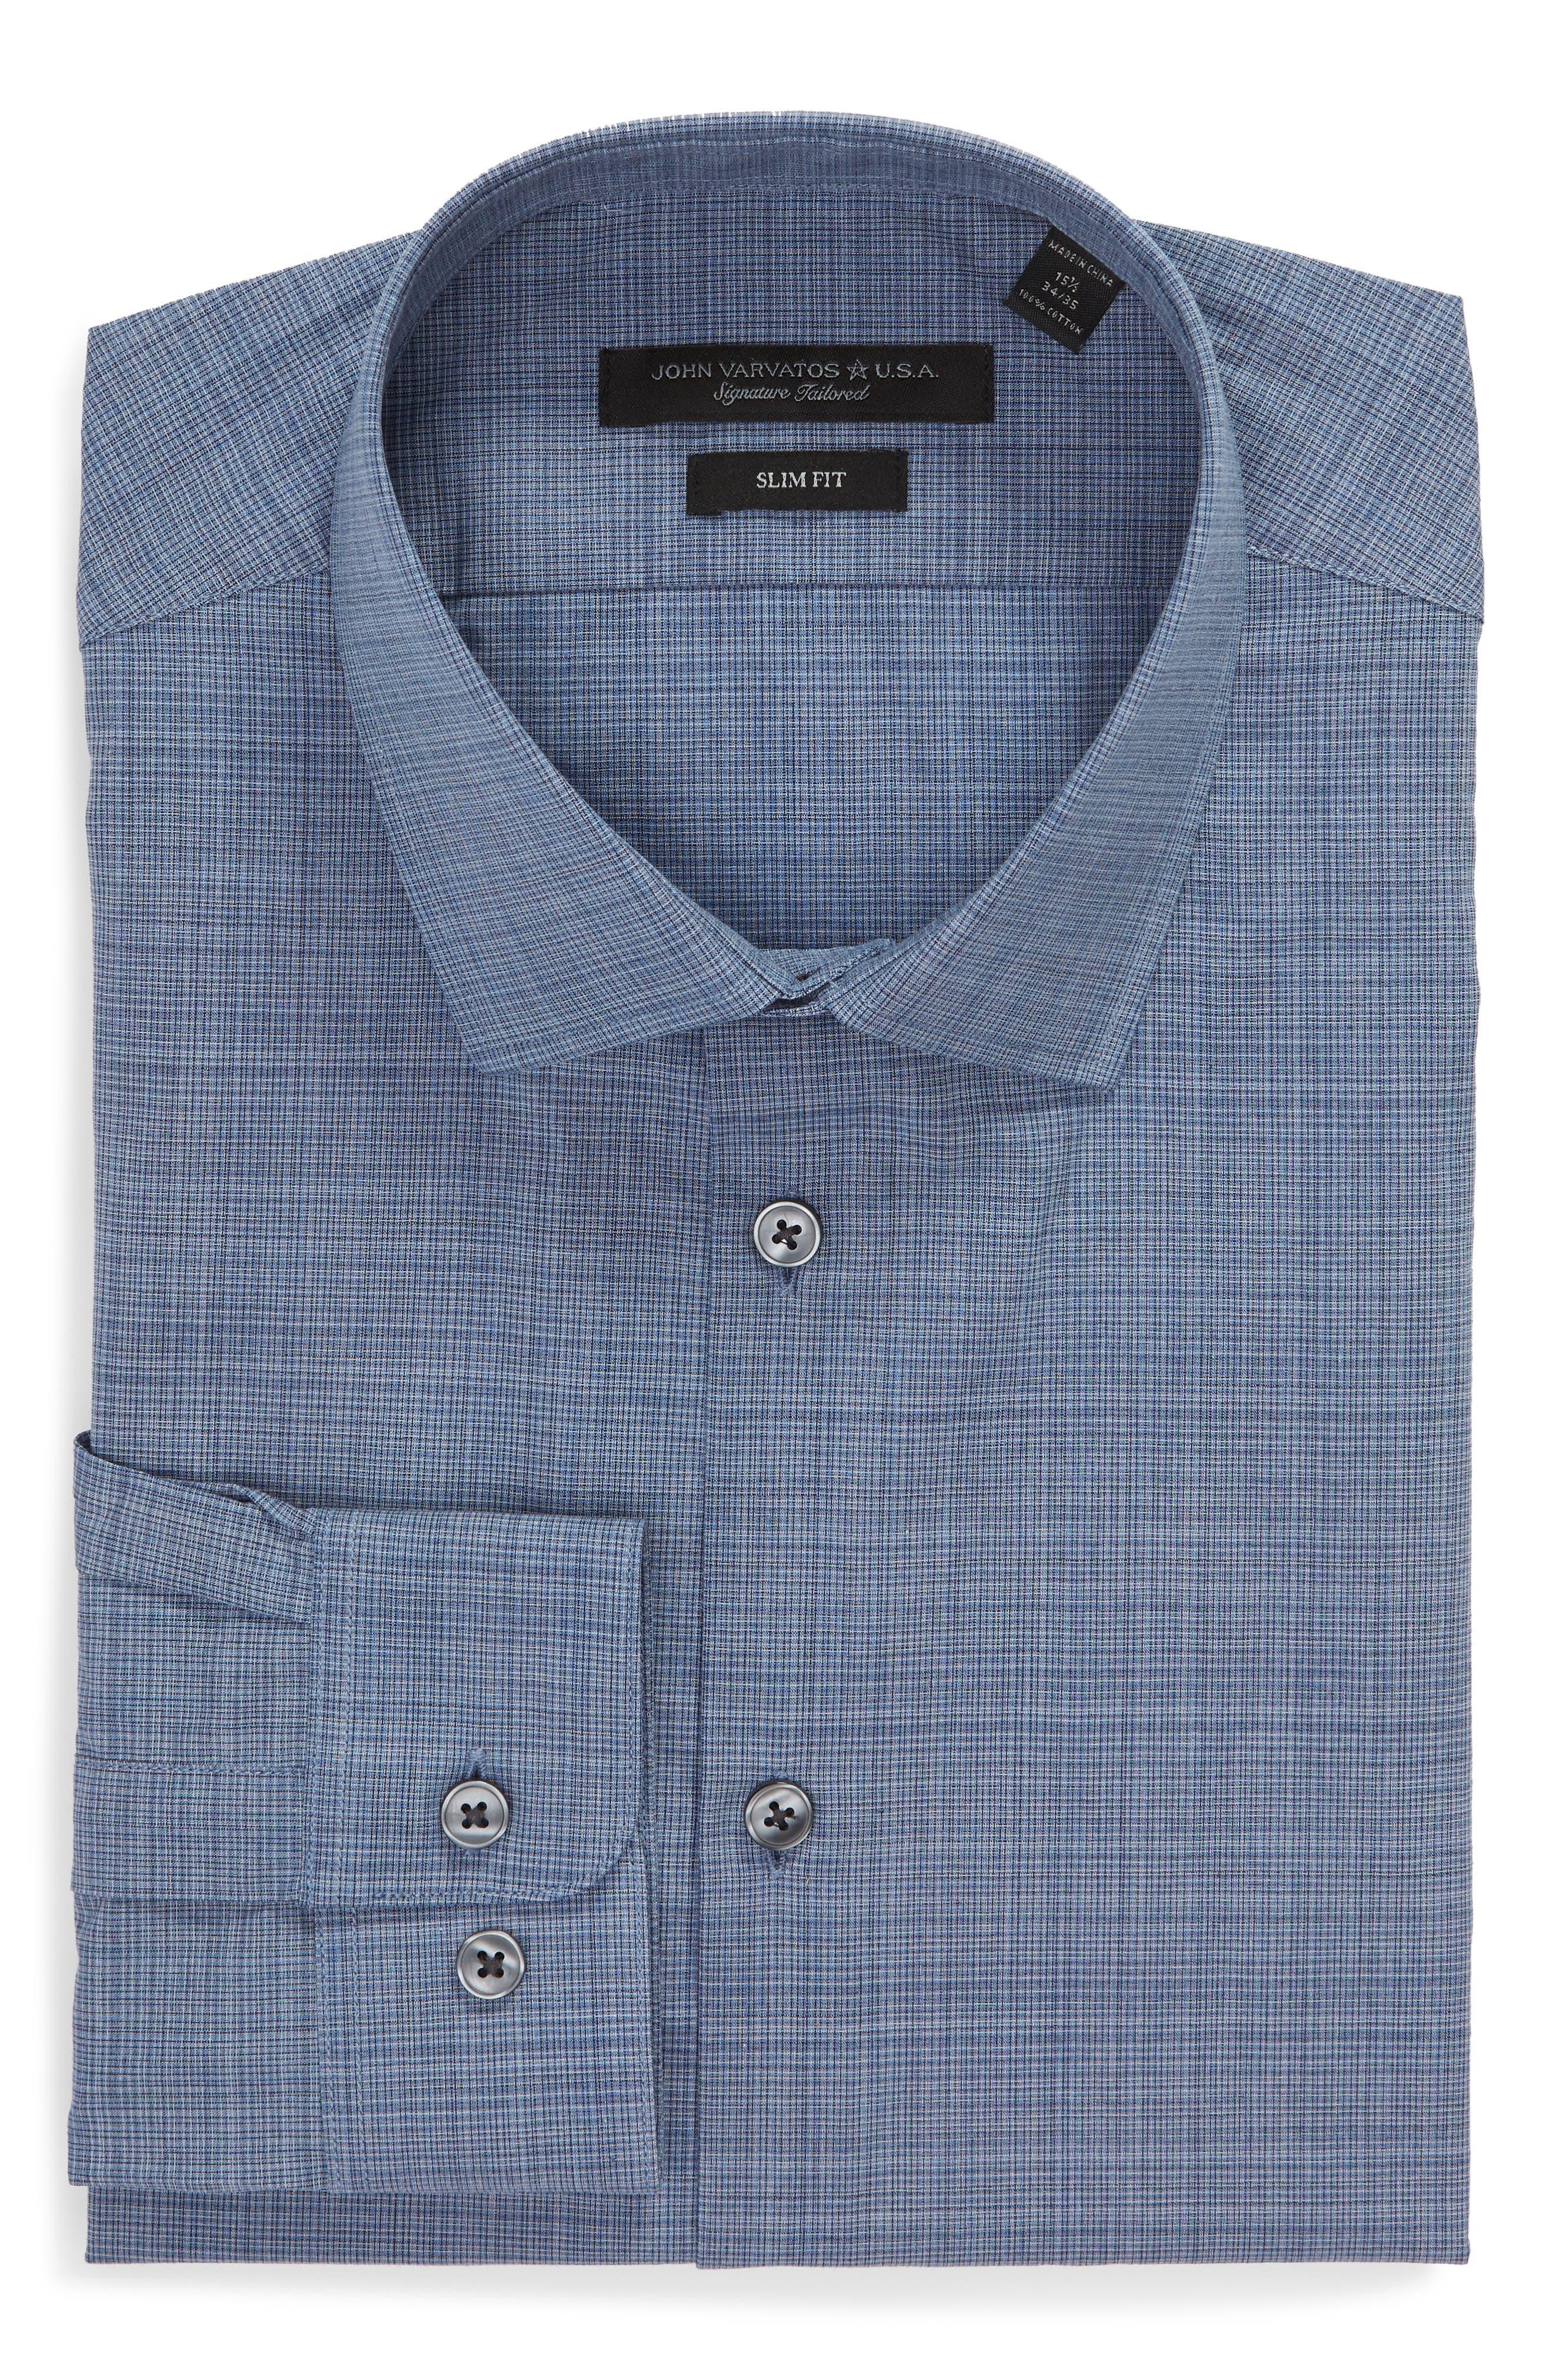 Slim Fit Check Dress Shirt,                             Alternate thumbnail 5, color,                             BLUE HEATHER